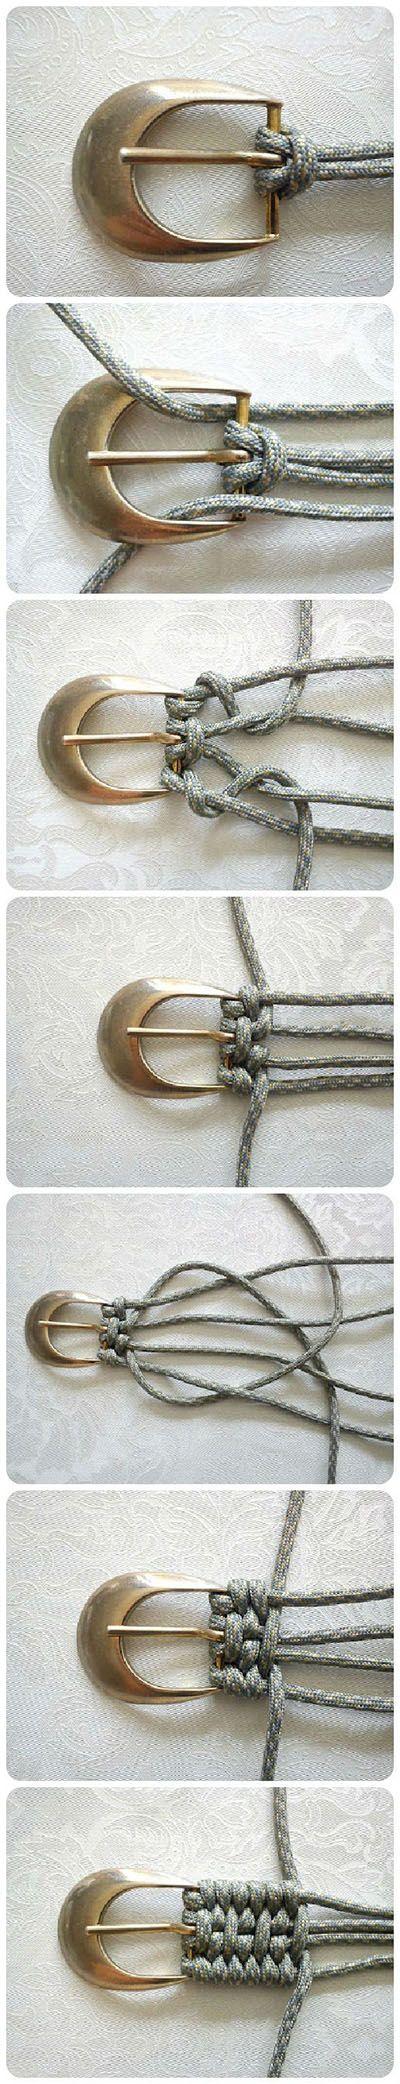 Tutorial for weaving a belt | DIY & Crafts Tutorials